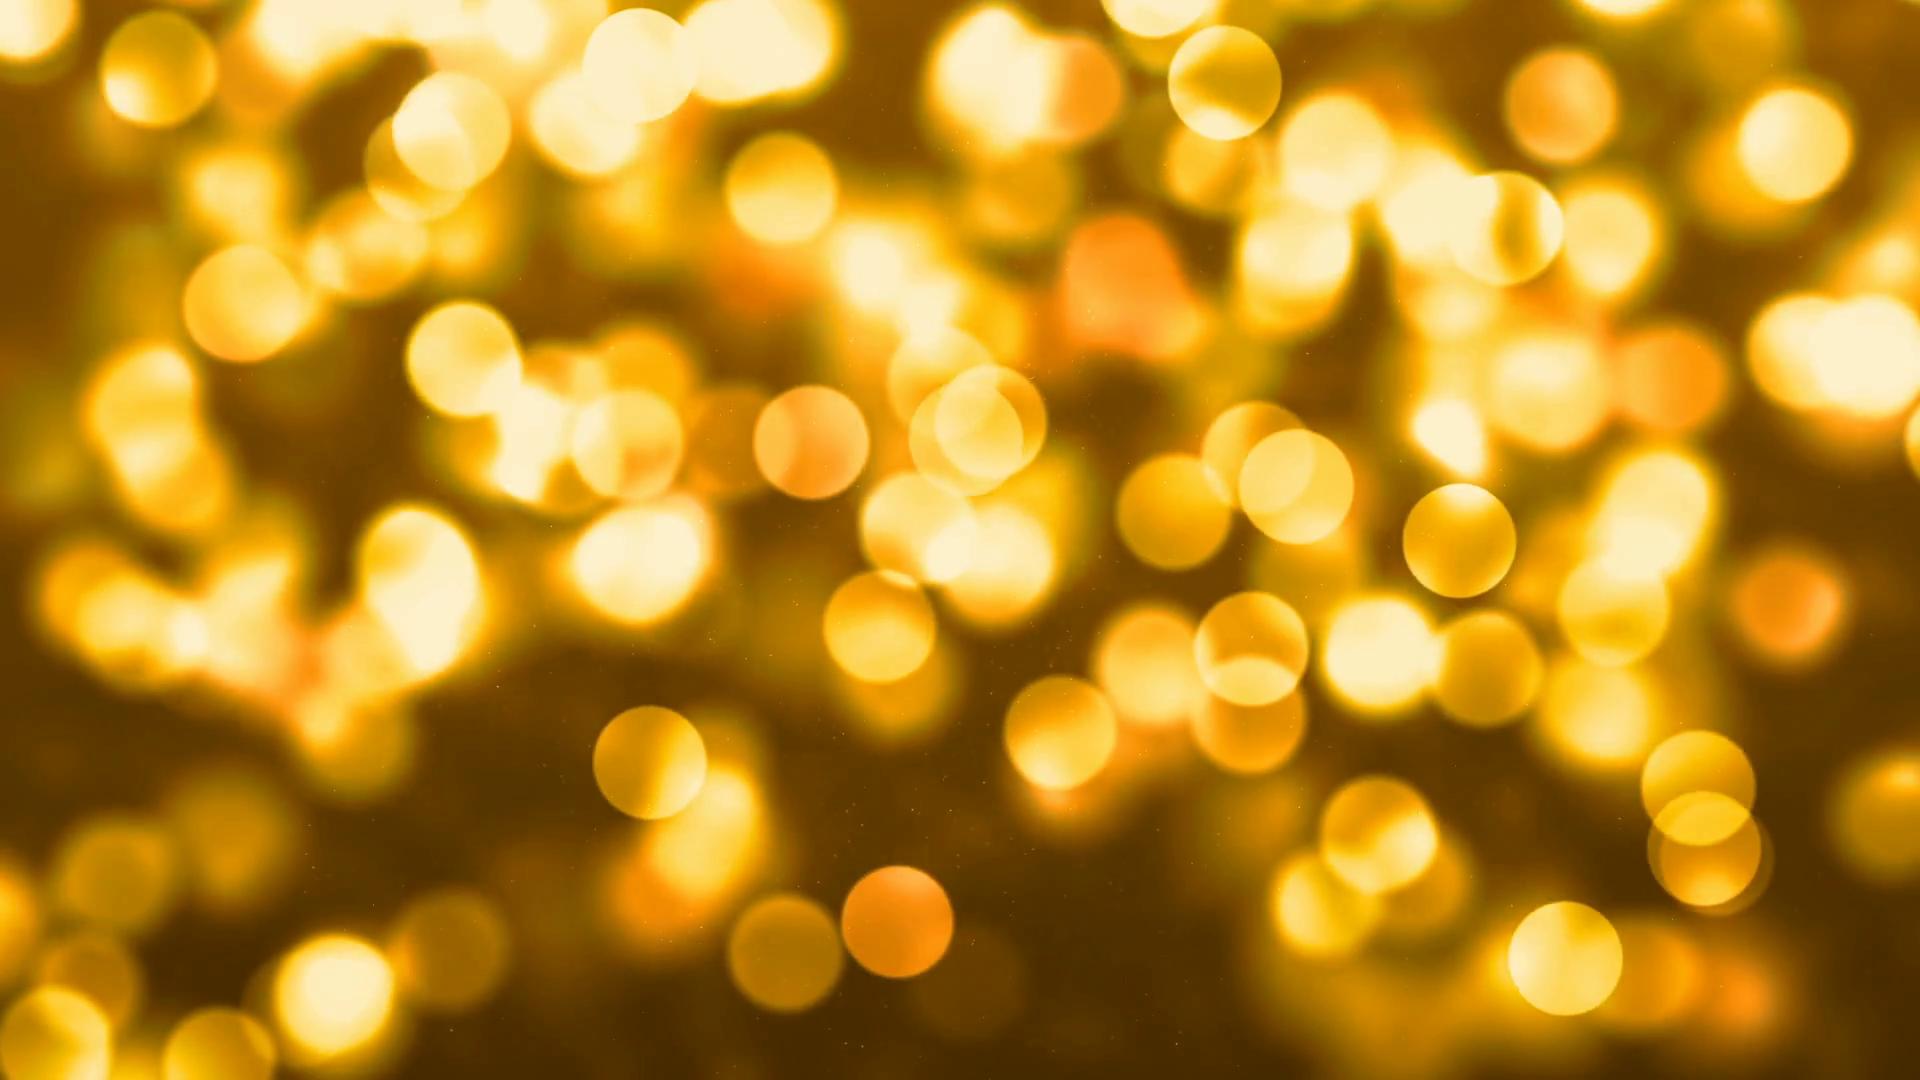 Yellow Bokeh Light Abstract Background Stock Video Footage - Videoblocks